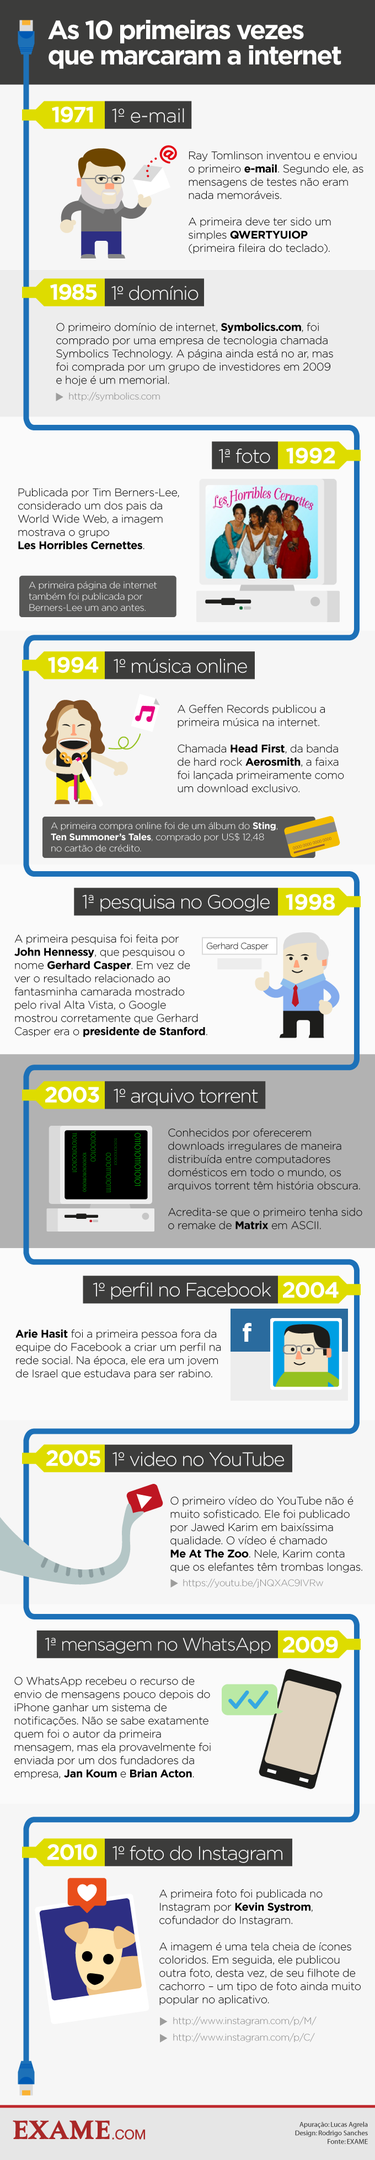 Infografico 10 fatos que marcaram a internet